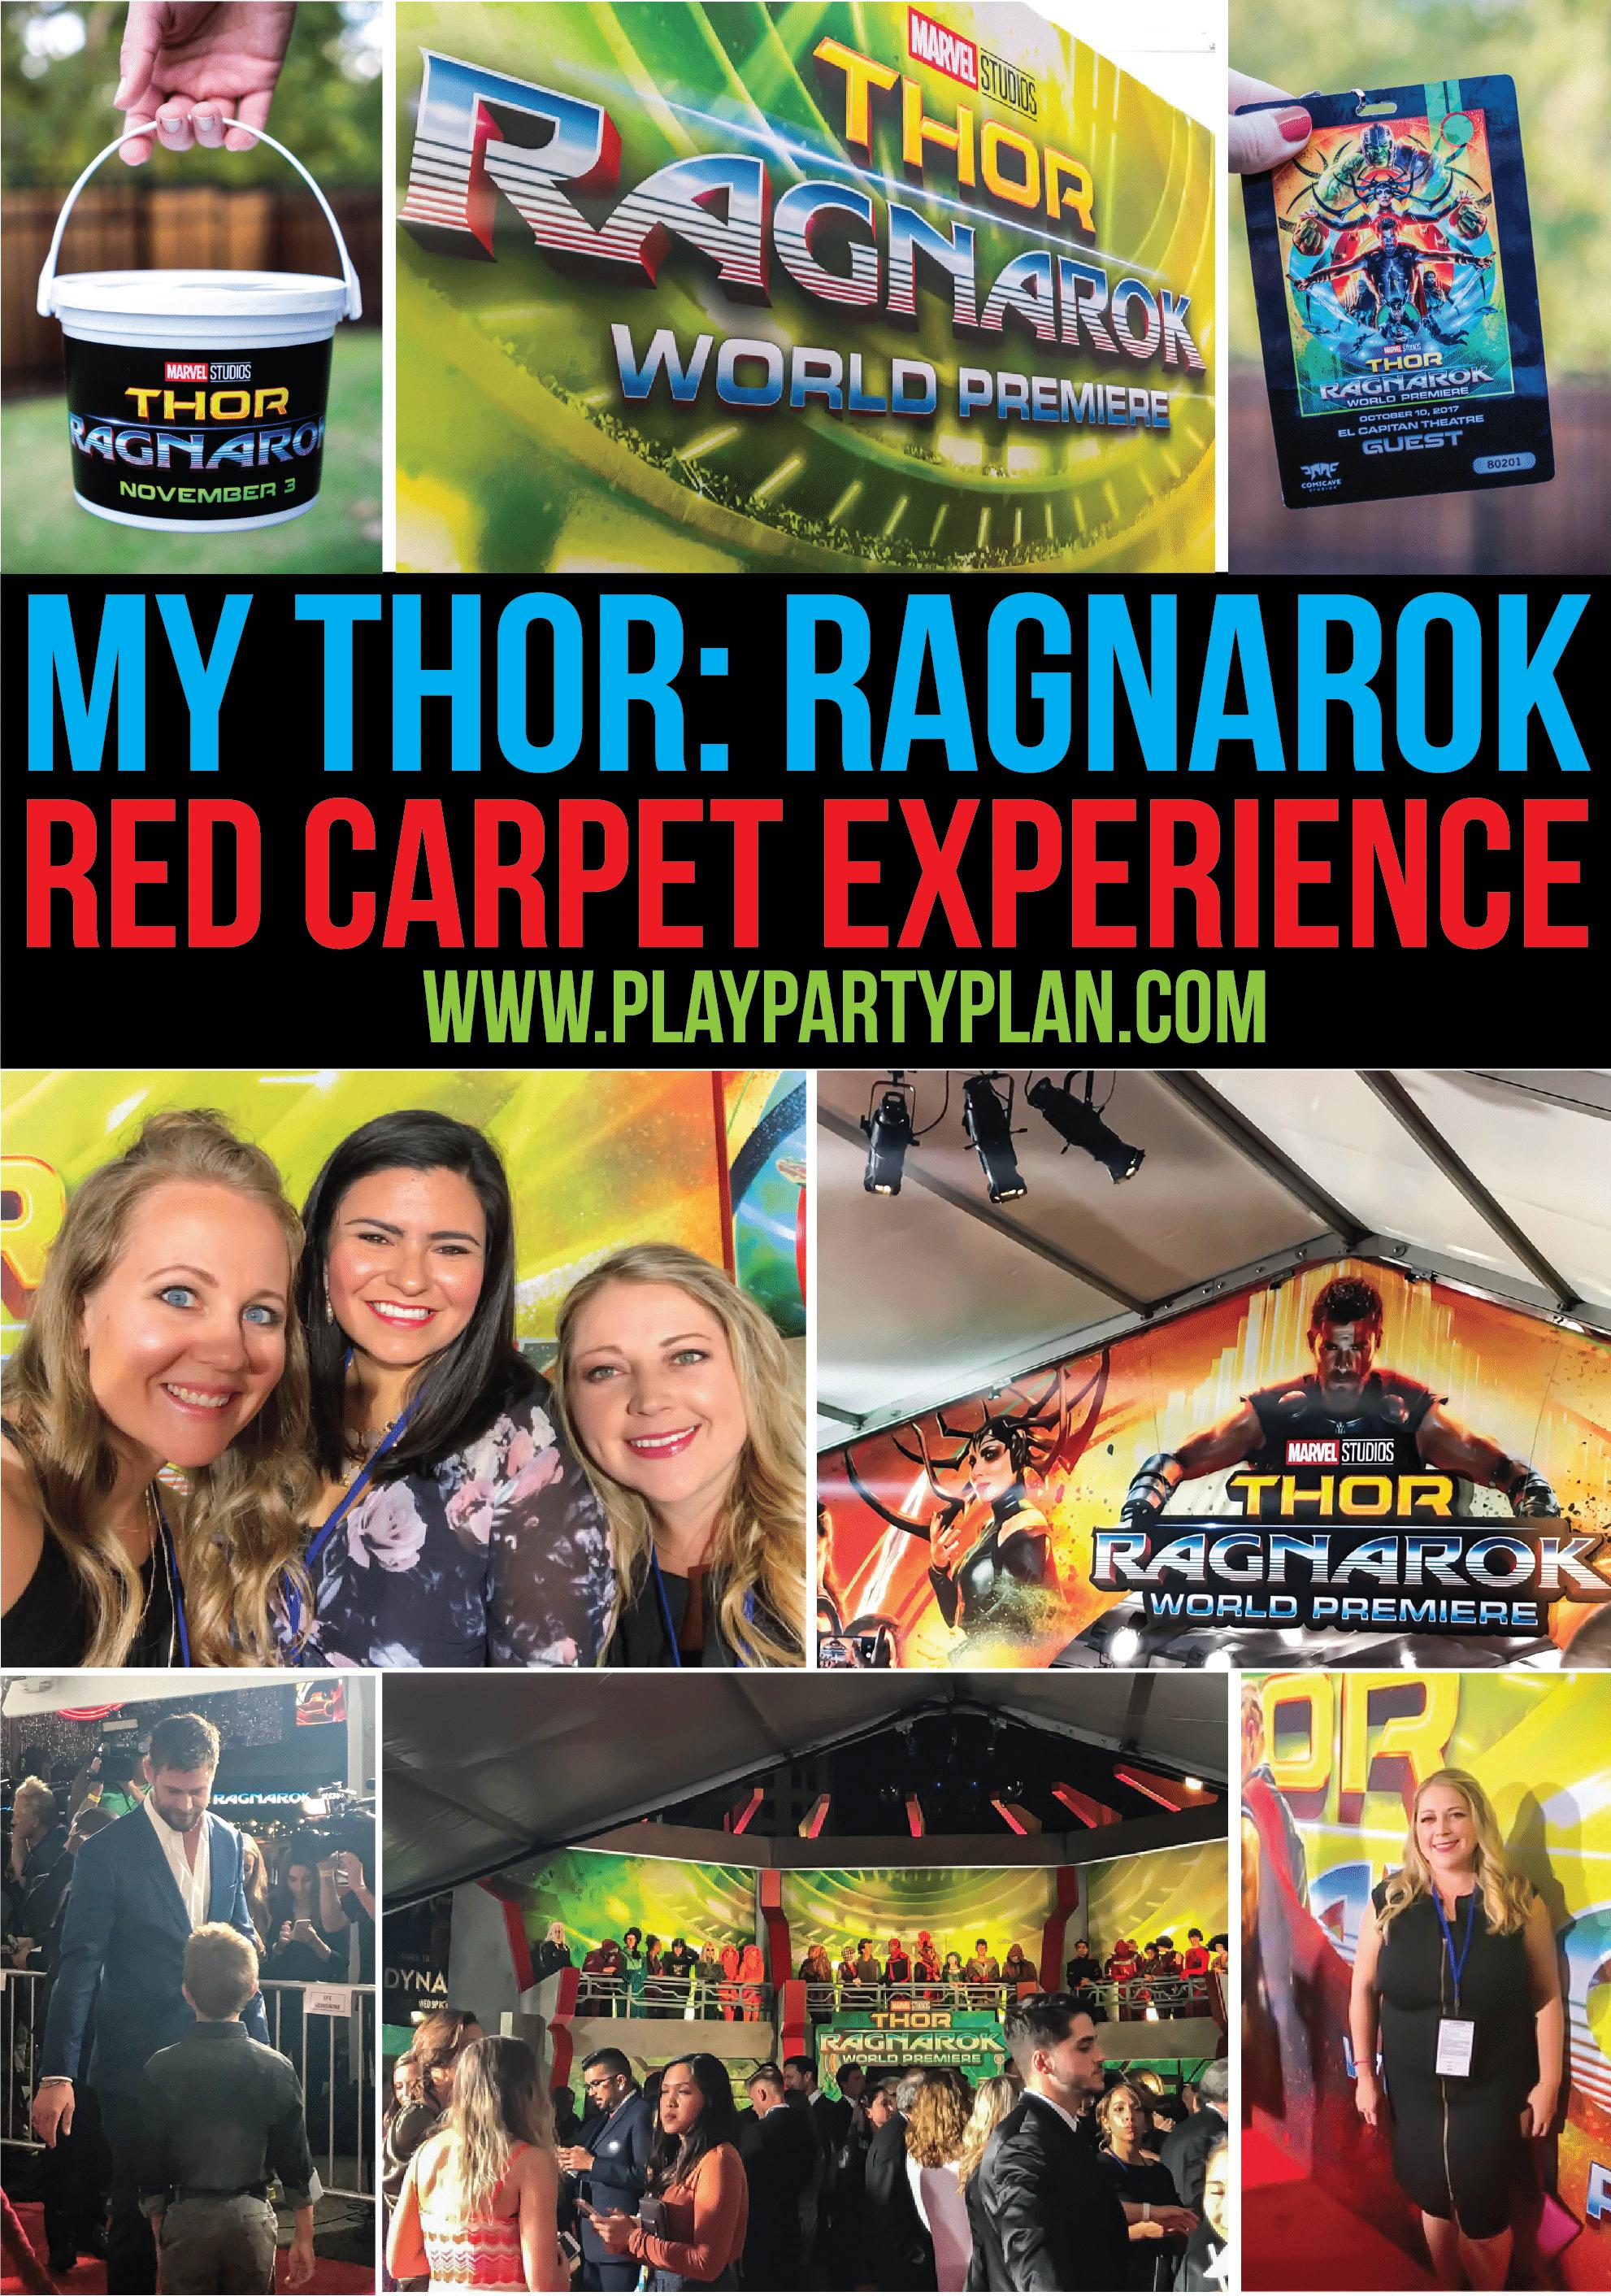 A Marvelous Night at the THOR: RAGNAROK Red Carpet World Premiere #ThorRagnarokEvent via @playpartyplan